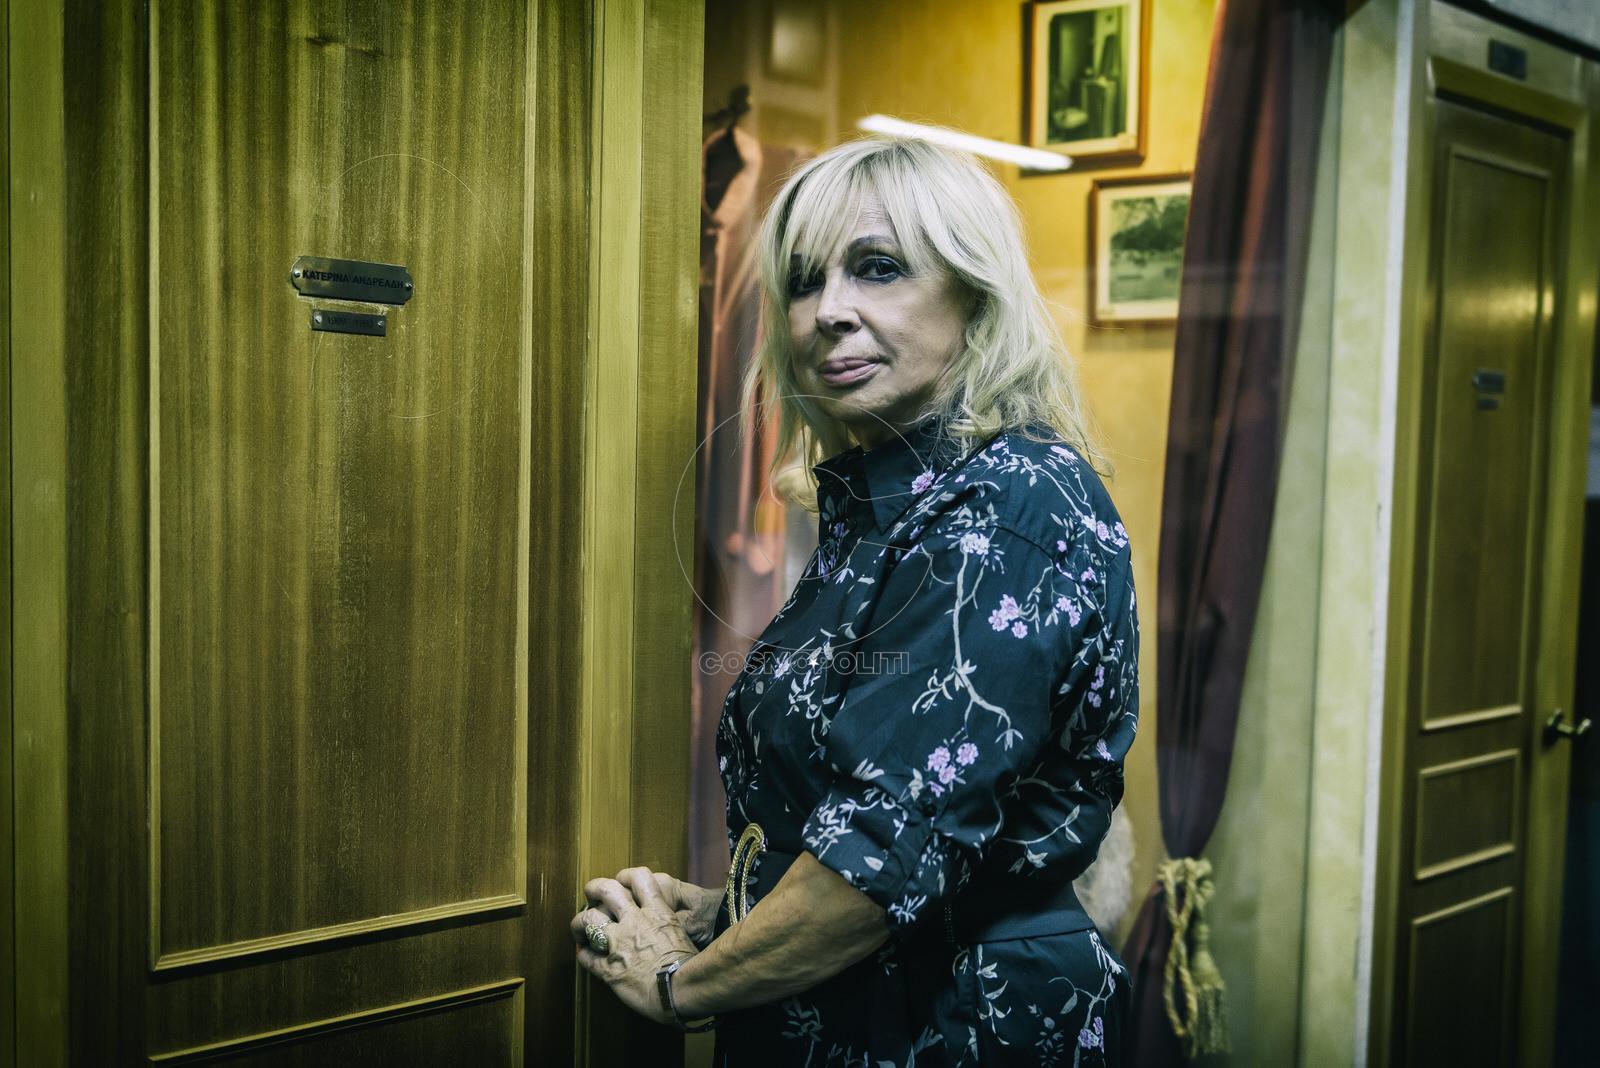 ANNA FONSOU MPROSTA APO TO KAMARINI THS KATERINA ANDREADH by ELINA GIOUNANLH